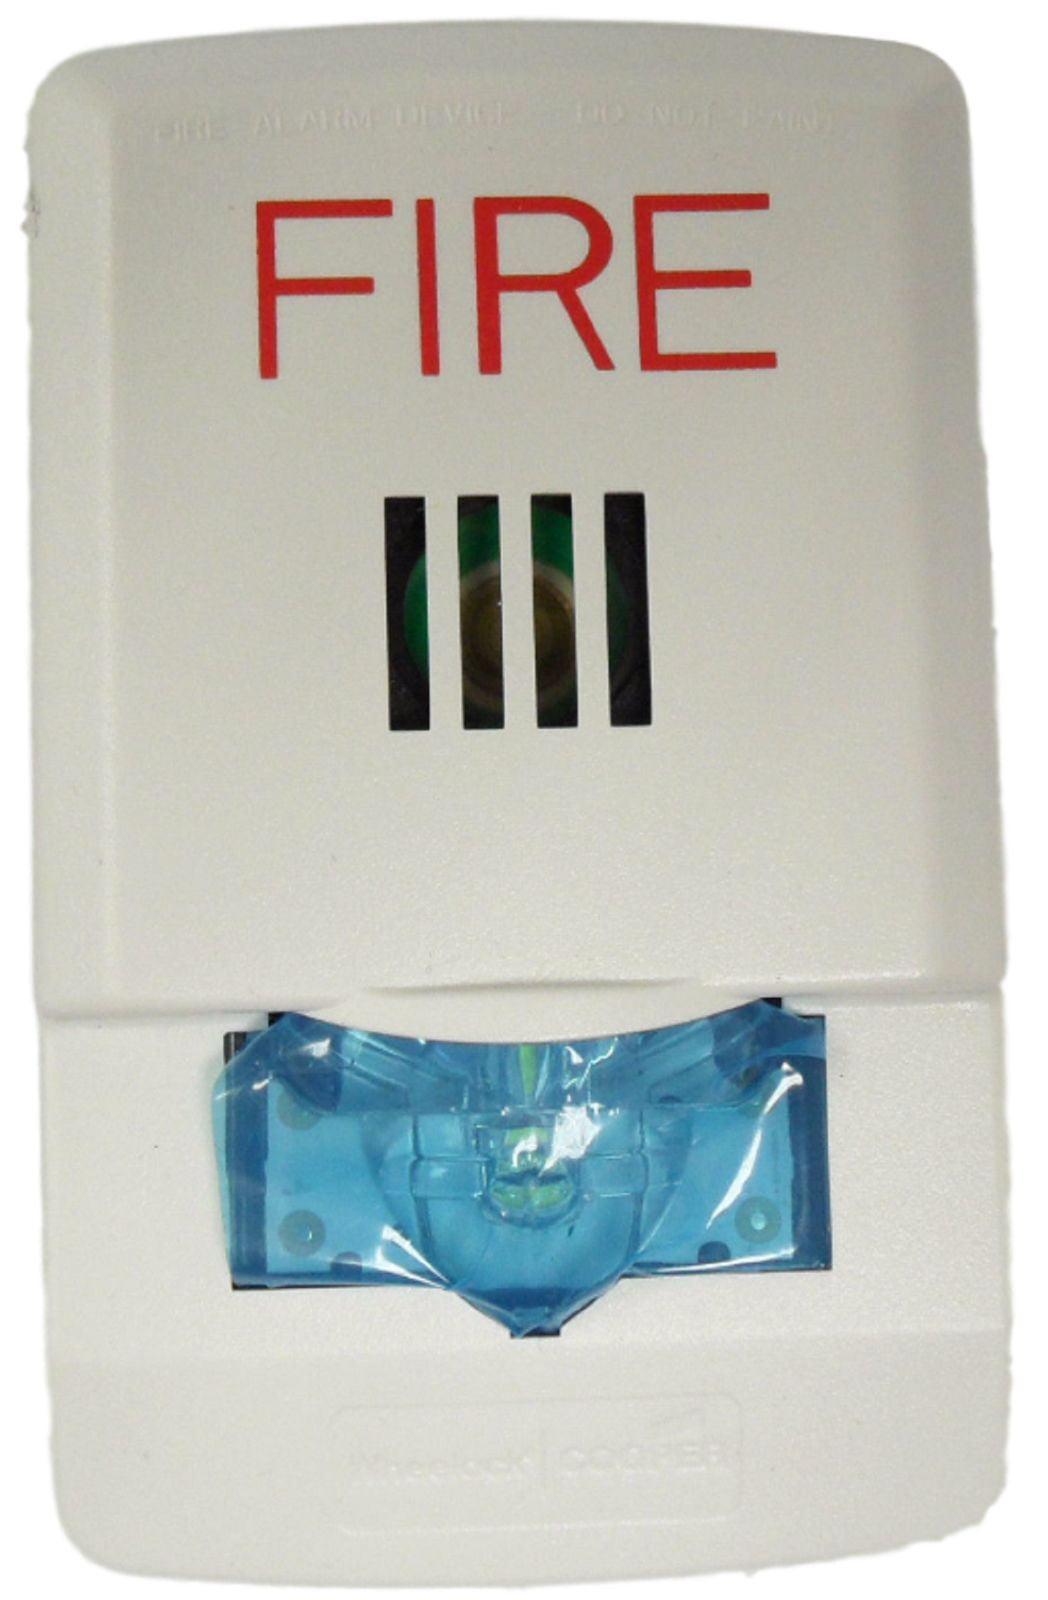 Wheelock LED Notification Appliances | Fire Alarms Online  |Wheelock Fire Alarm Horn Strobe